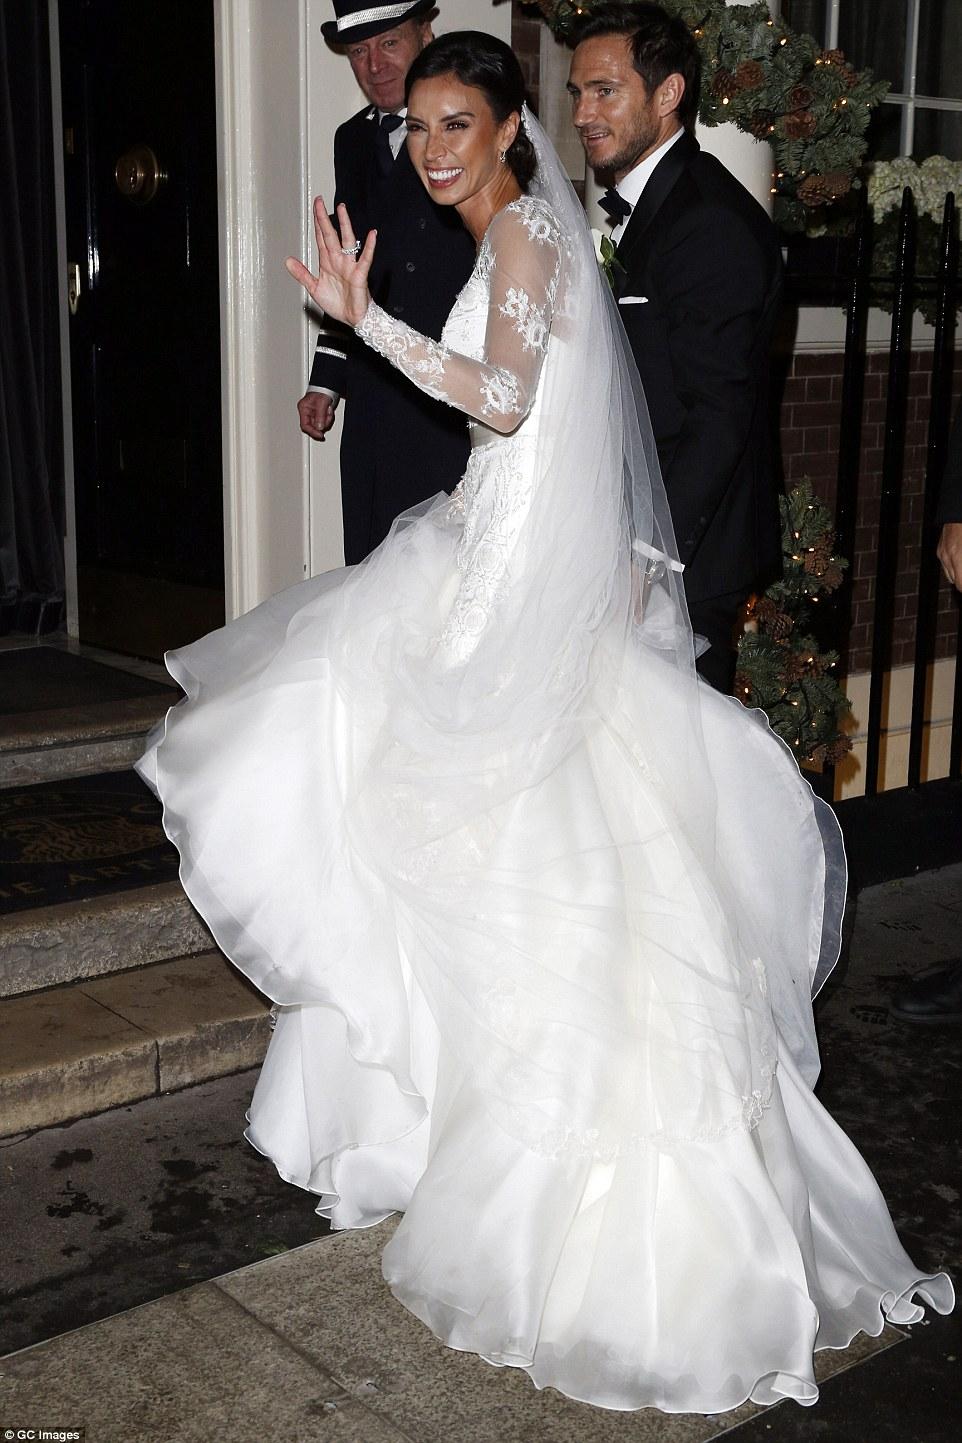 Frank Lampard and Christine Bleakley Wedding Ceremony